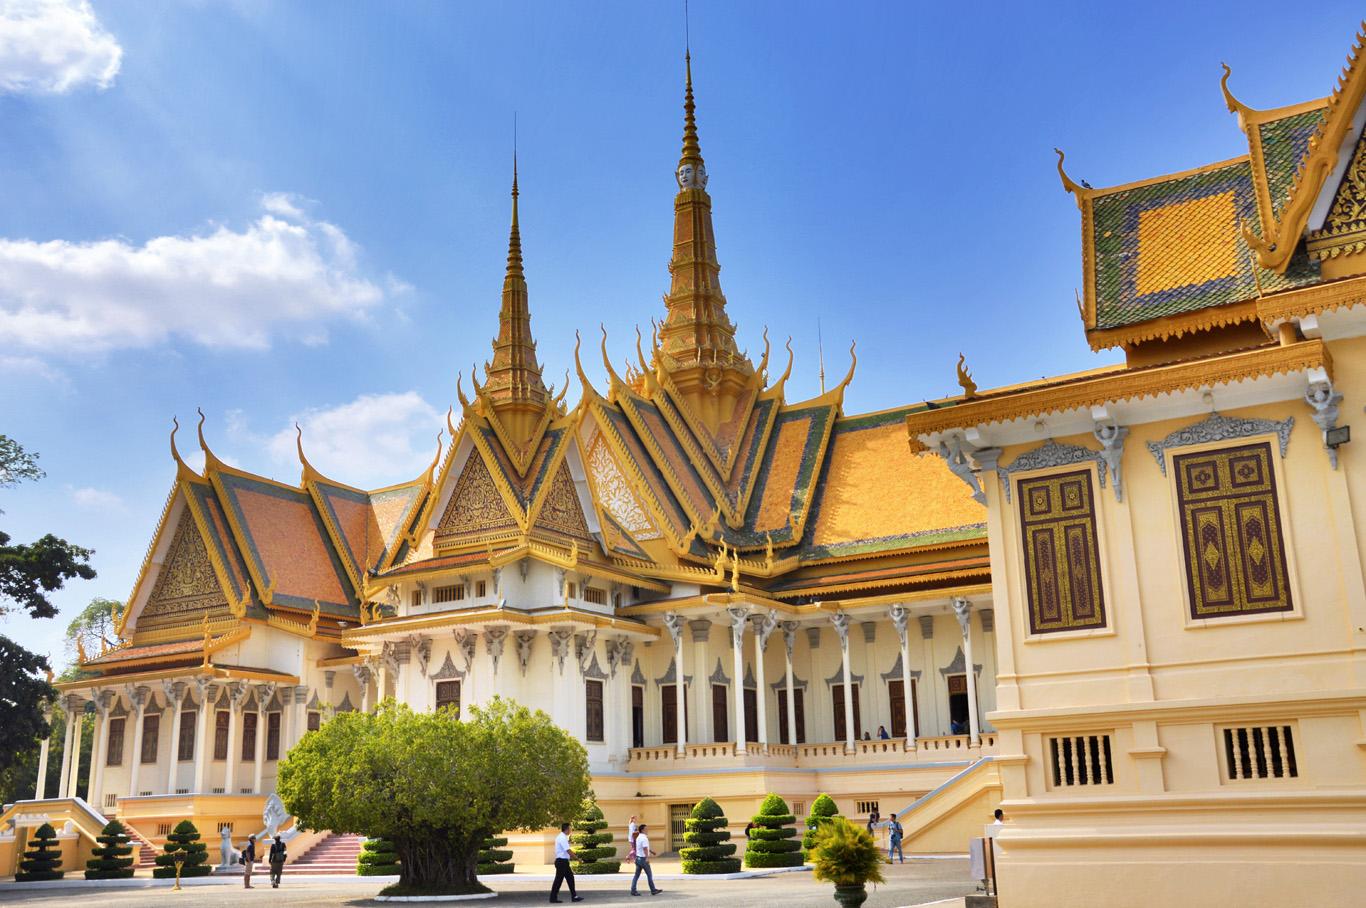 Royal Palace - The Throne Hall